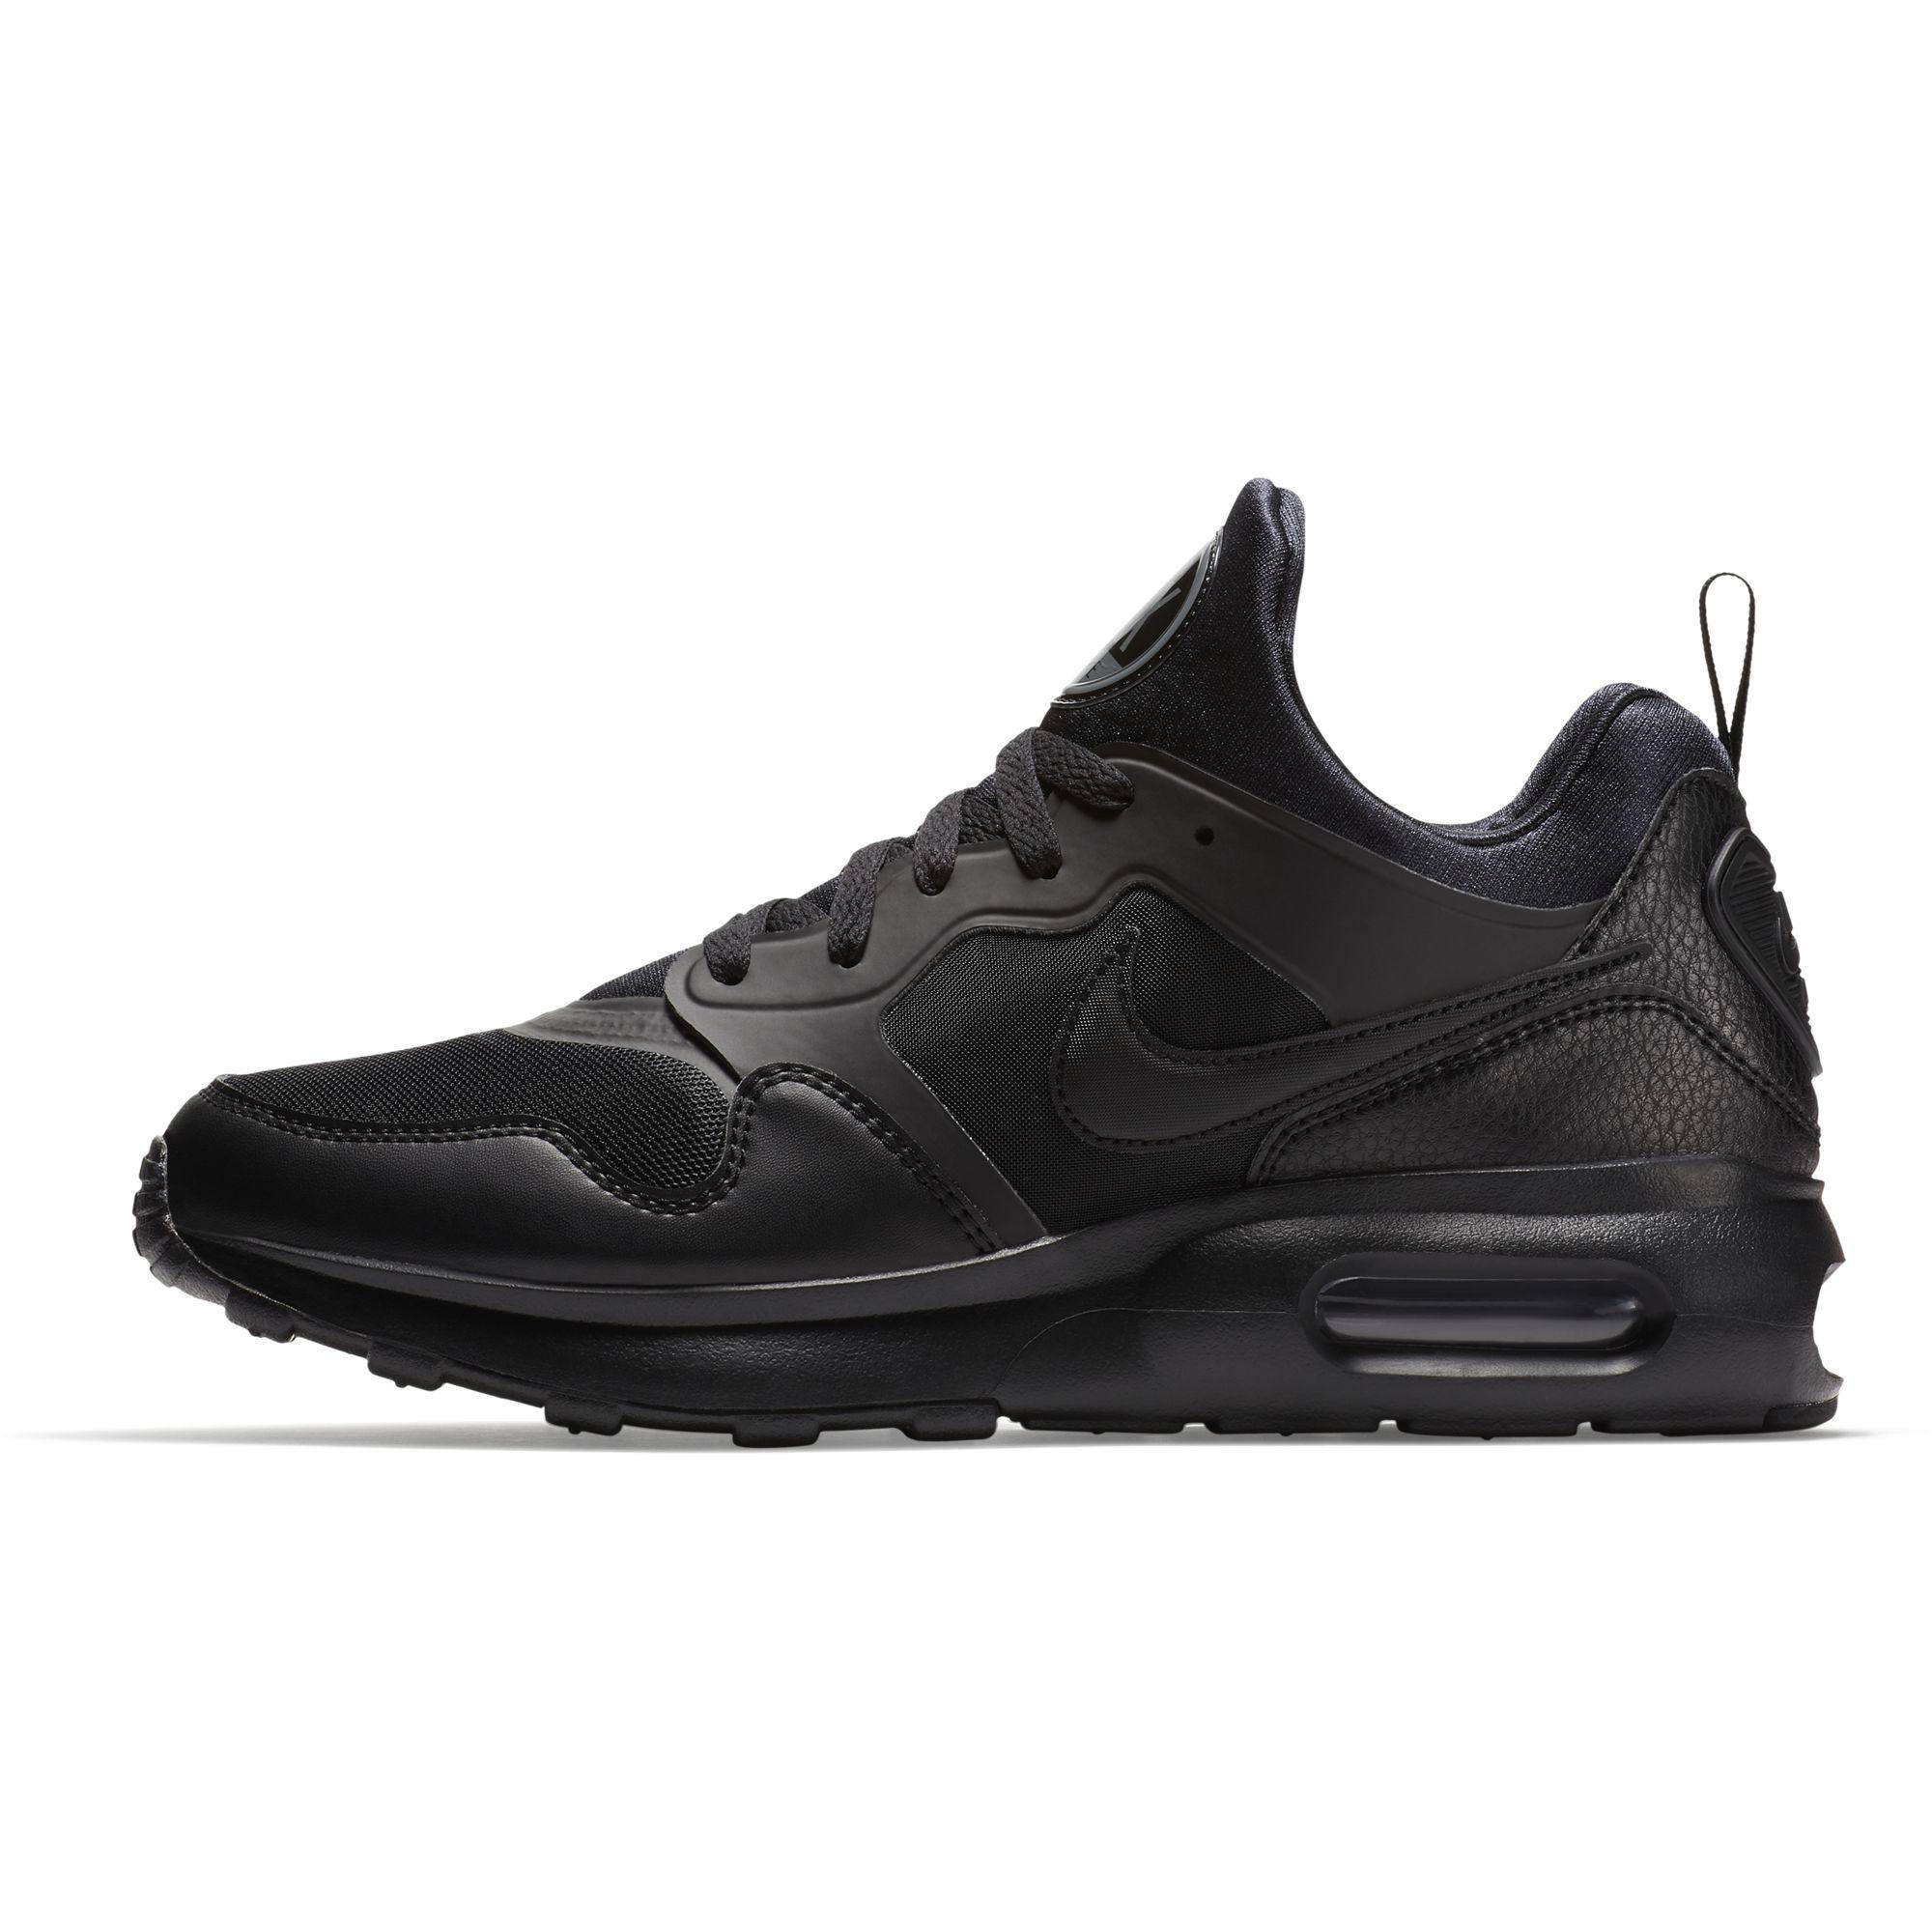 online retailer 64469 62988 Nike Mens Air Max Prime Shoes - Black Dark Grey - Tennisnuts.com